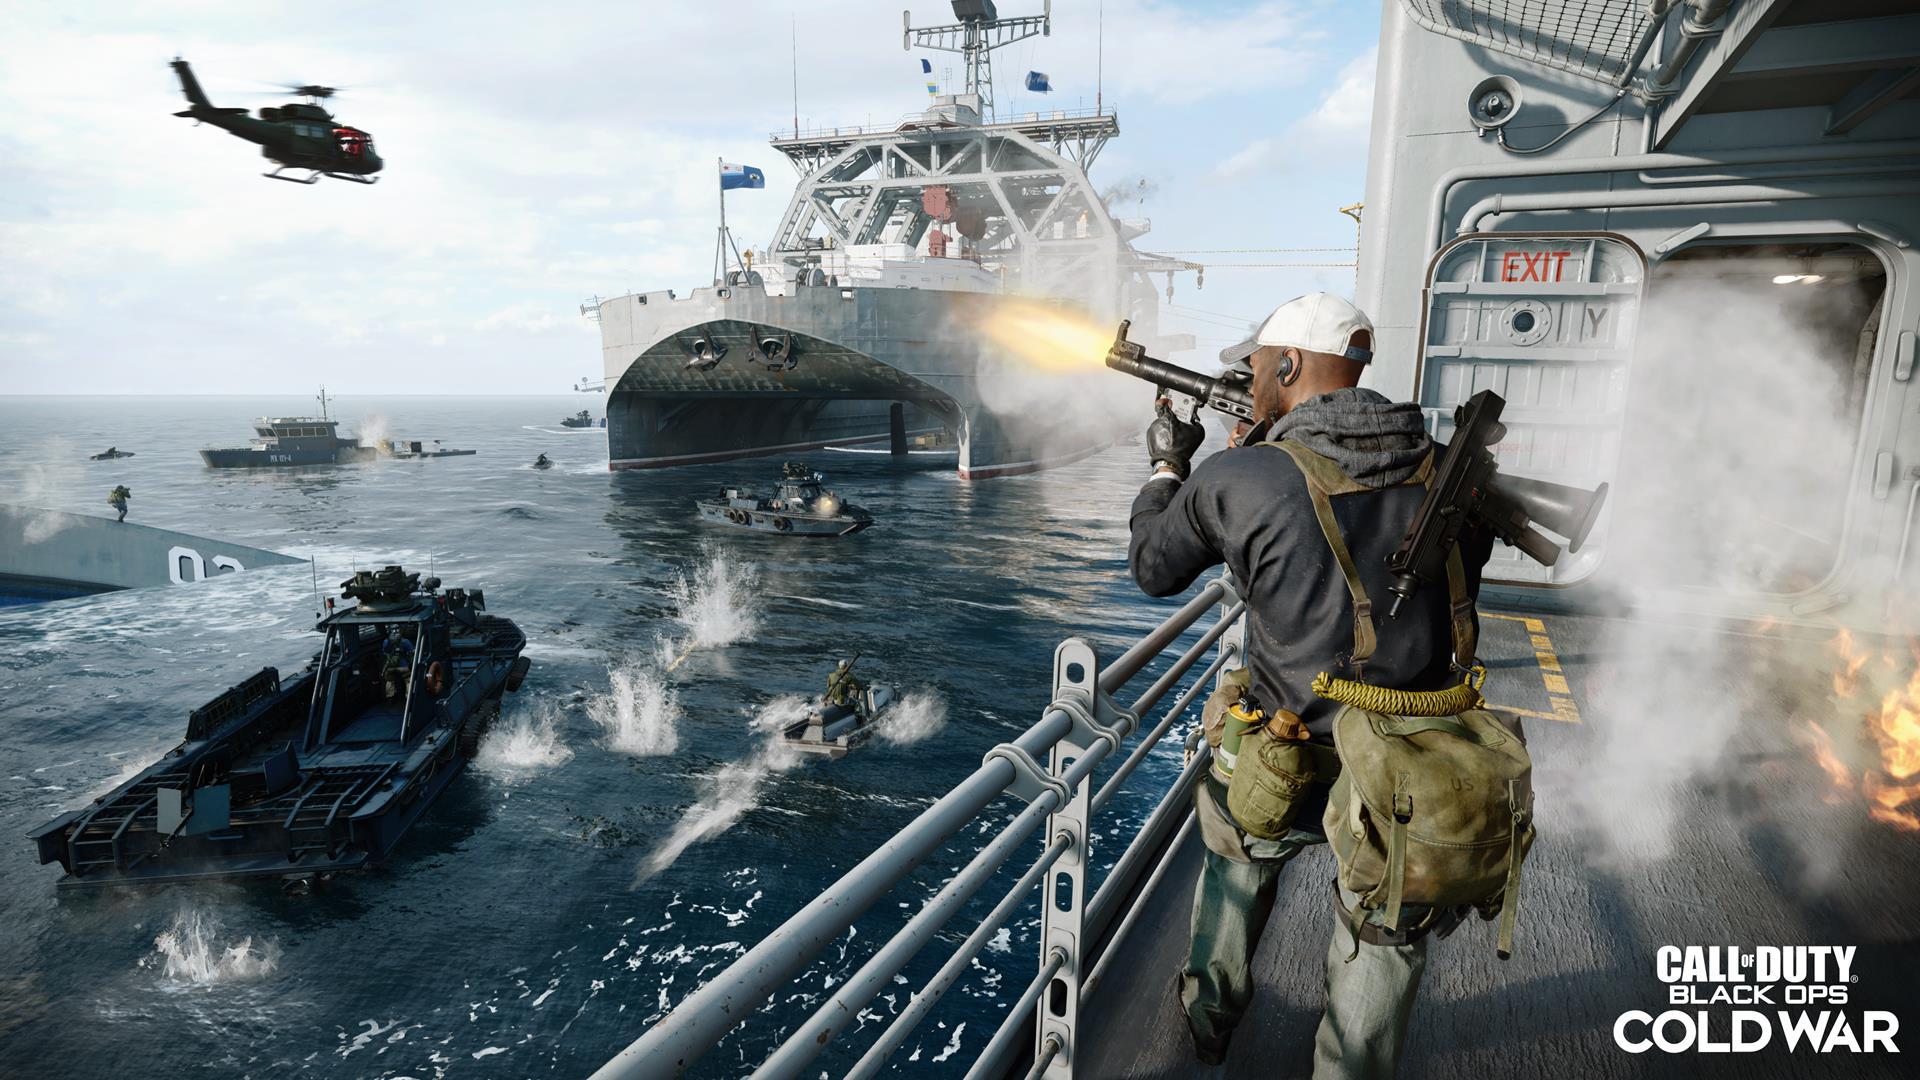 Call of Duty: Black Ops Cold War multiplayer scorestreaks